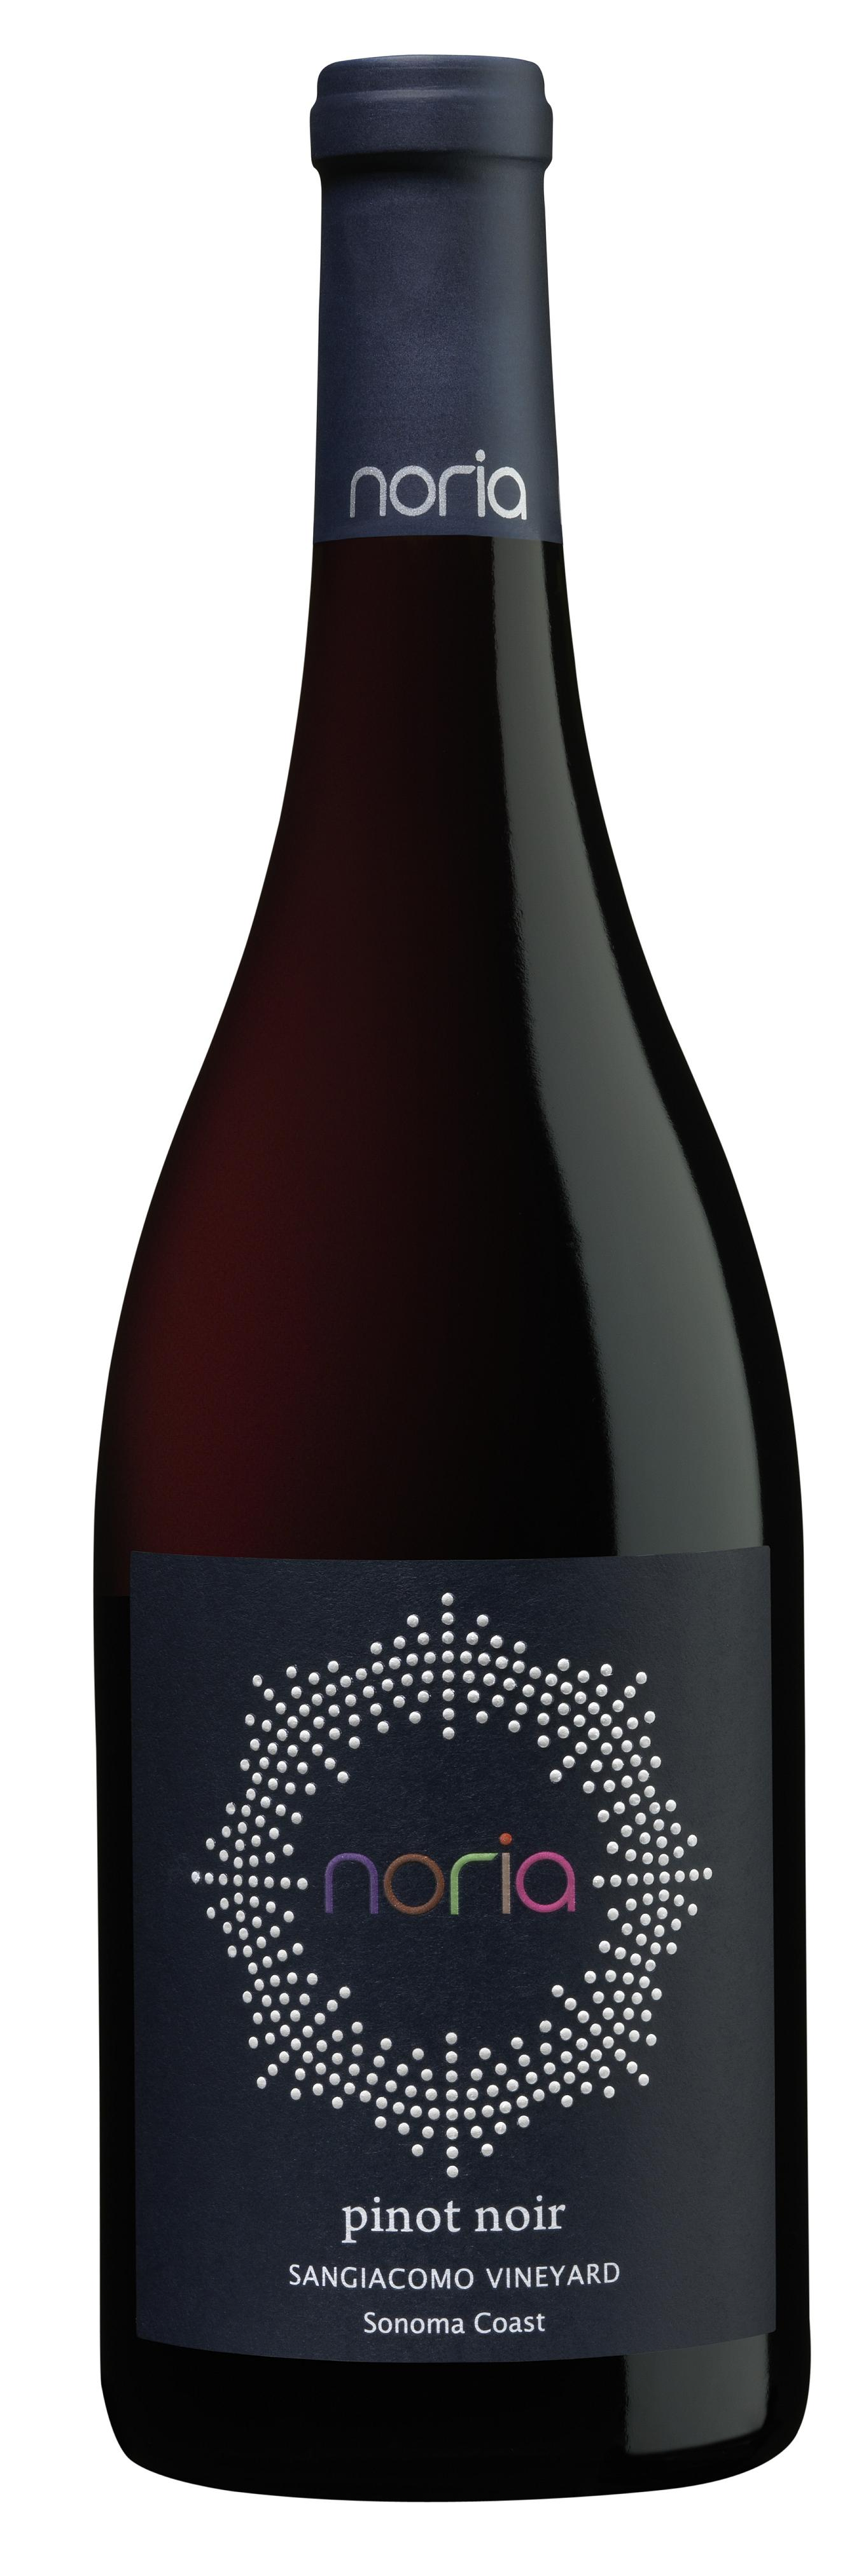 Noria Pinot Noir bottle 001